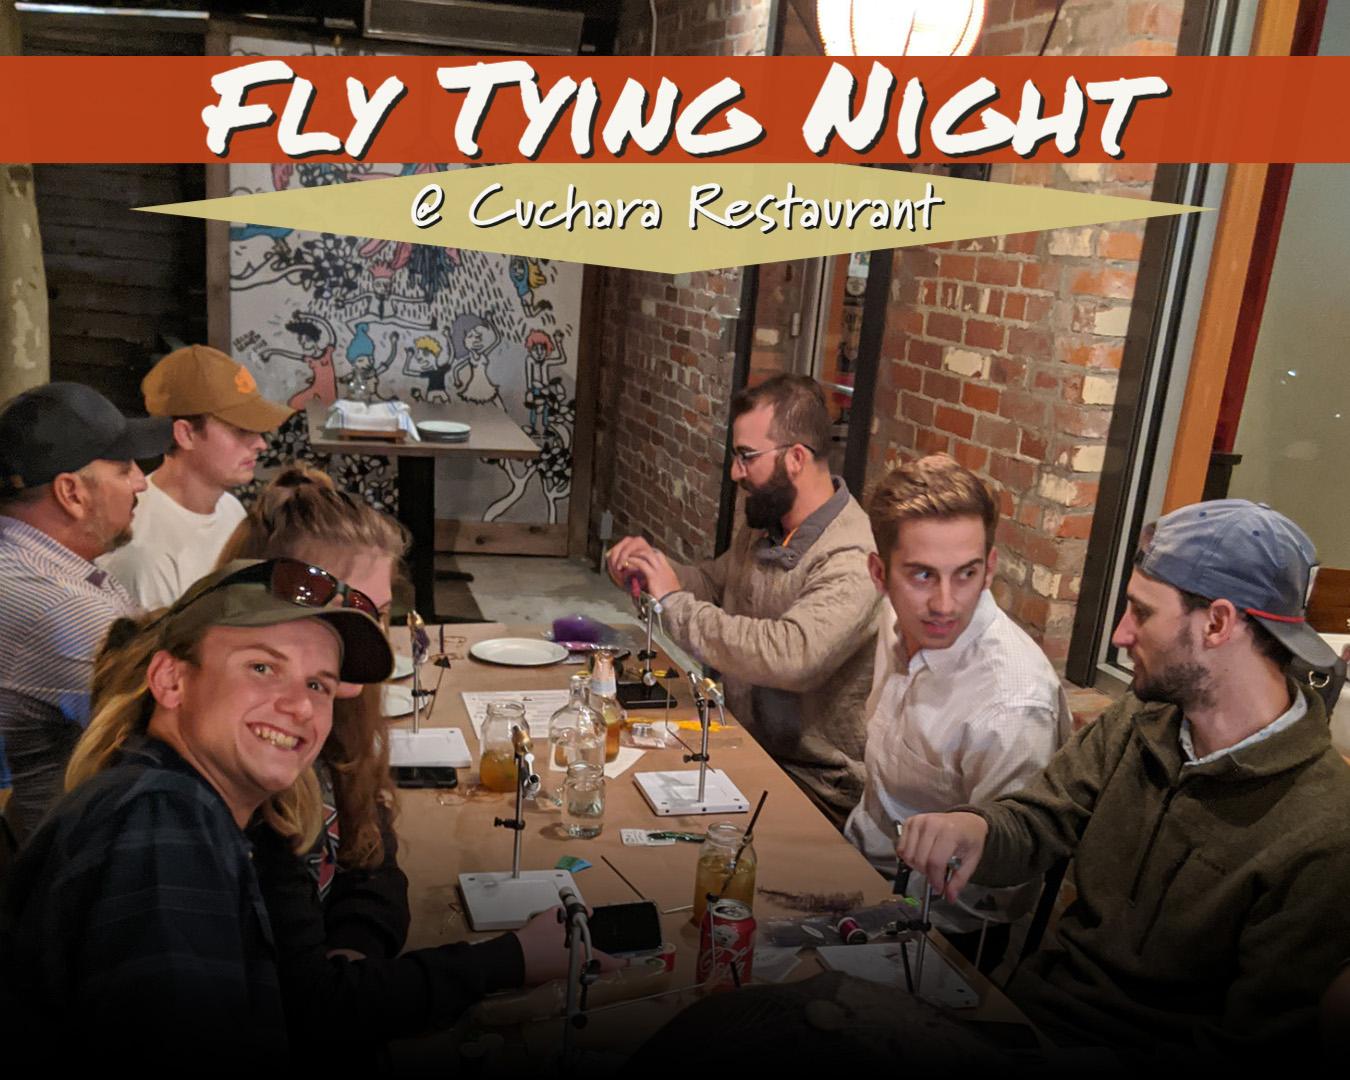 Fly Tying Night at Cuchara Restaurant